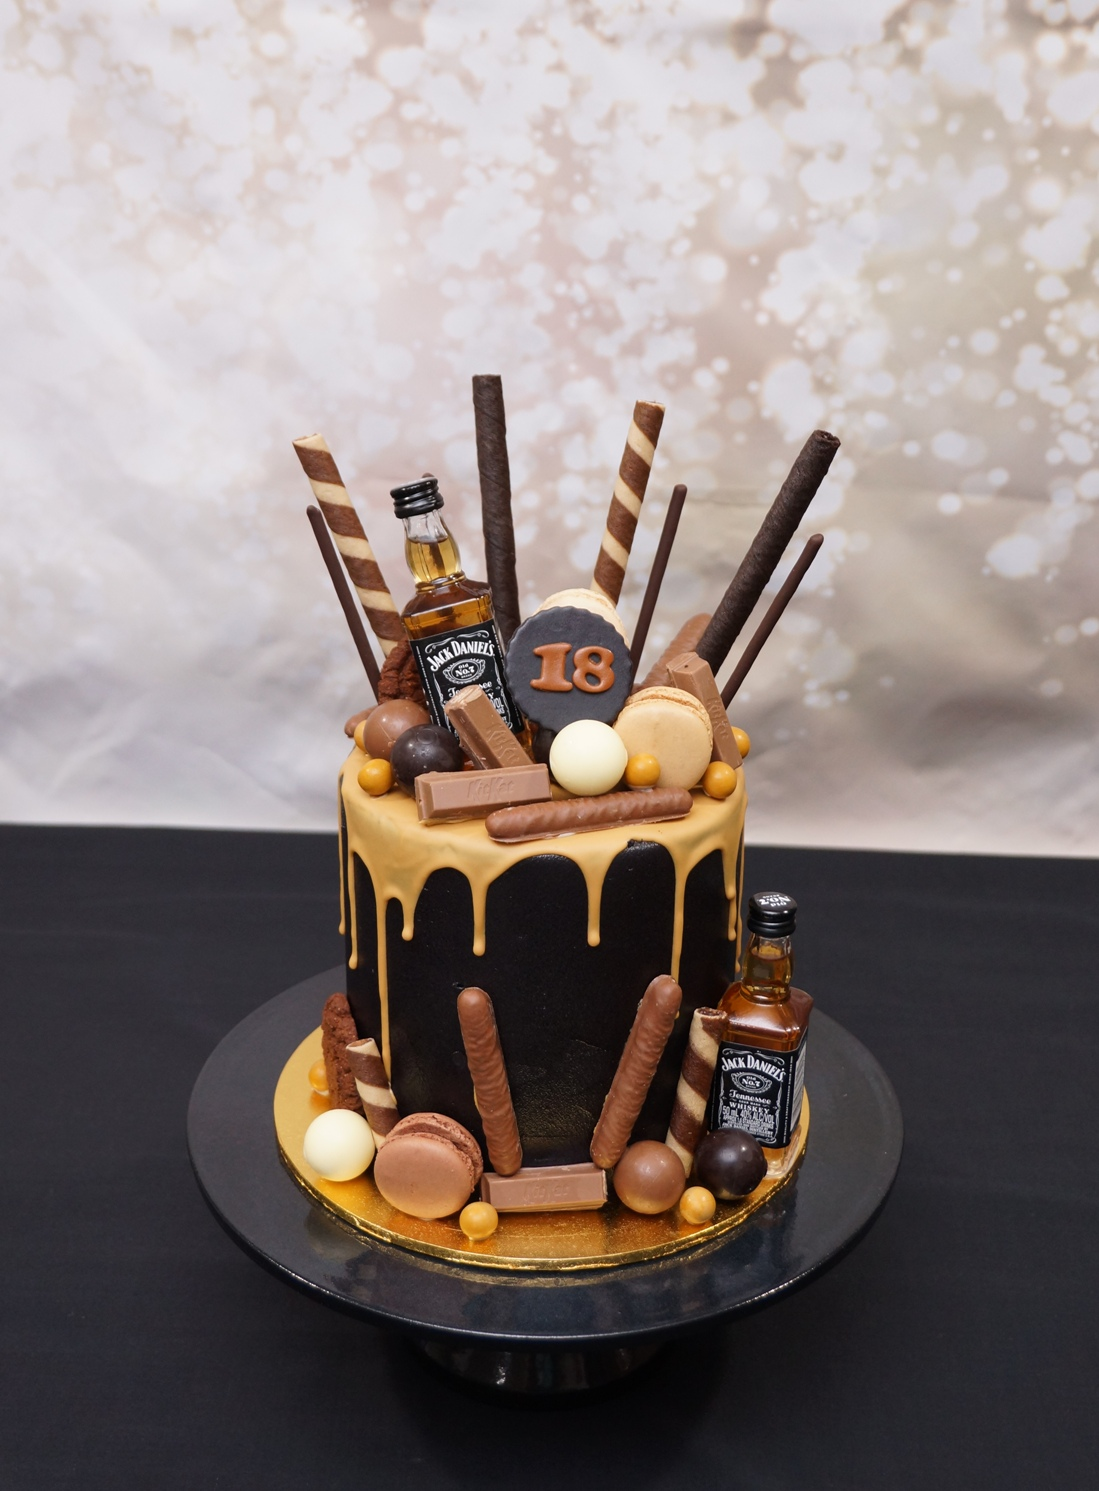 Jack Daniels Drip Cake - 28.11.20